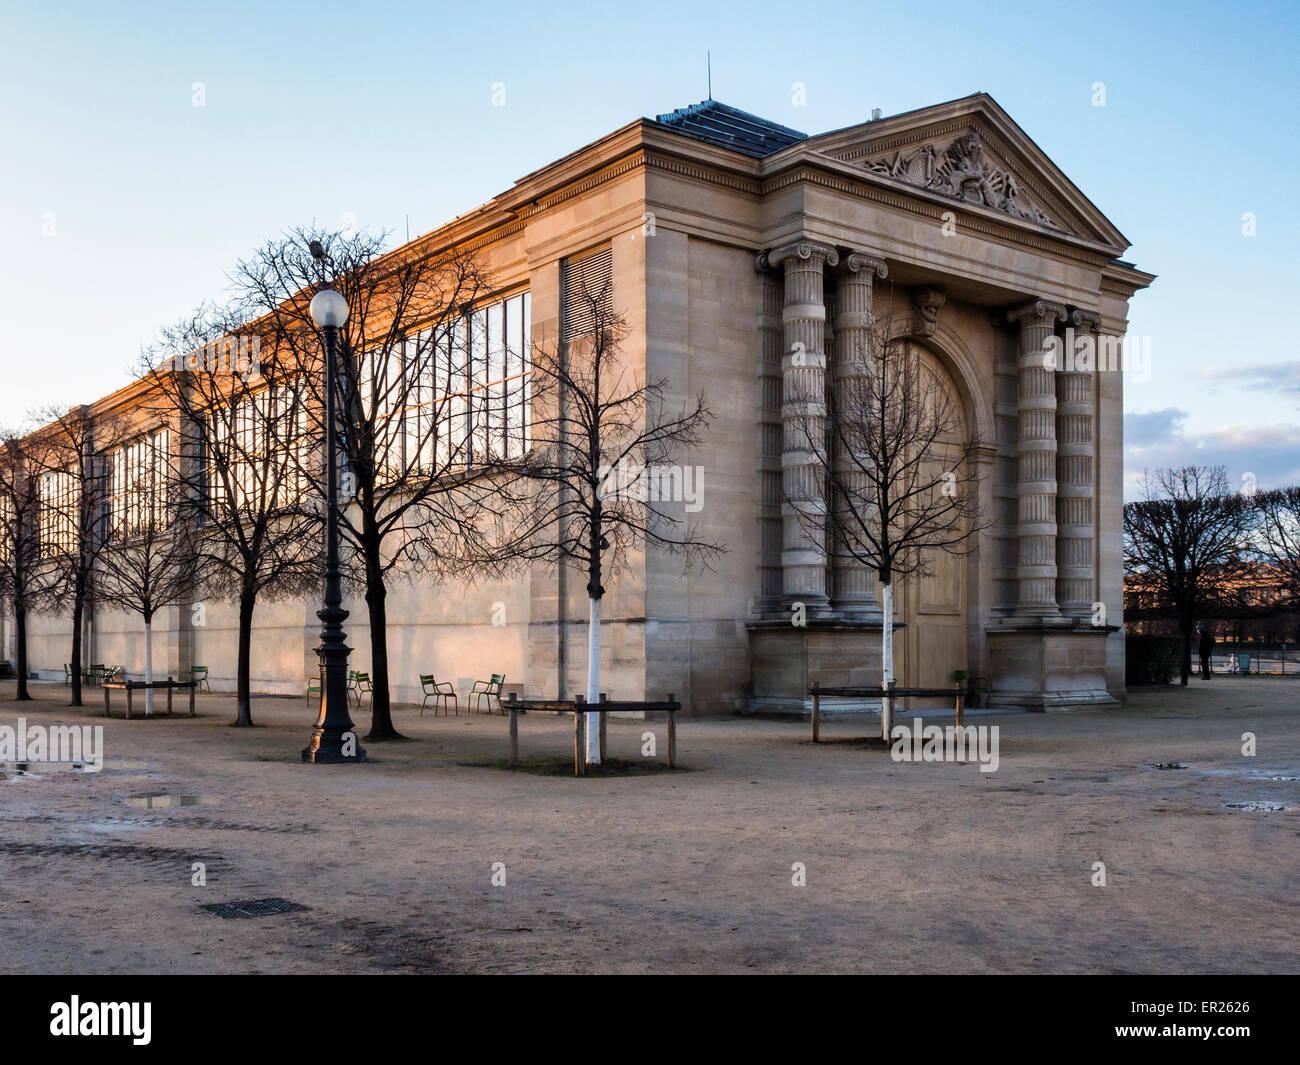 Musée de l'Orangerie, Orangerie museo de arte alberga obras de arte de Monet en La Terrasse du bord de l'Eau, Jardines de las Tullerías, París Foto de stock